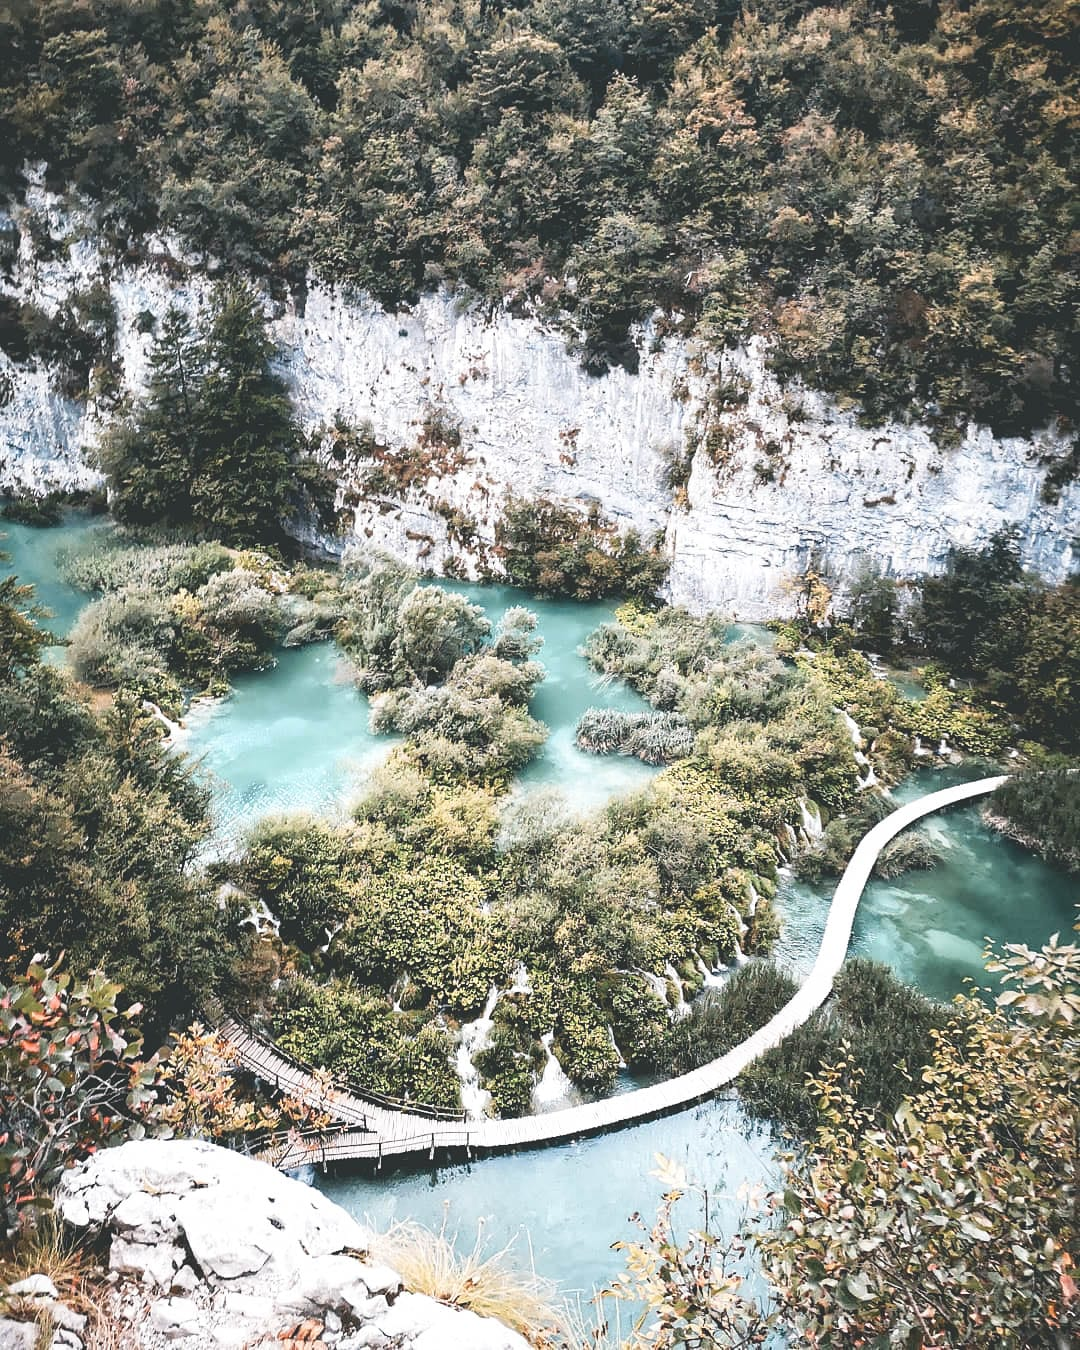 Camping Plitvice: Het Plitvice National Park Is Het Mooiste Sprookjesbos Van